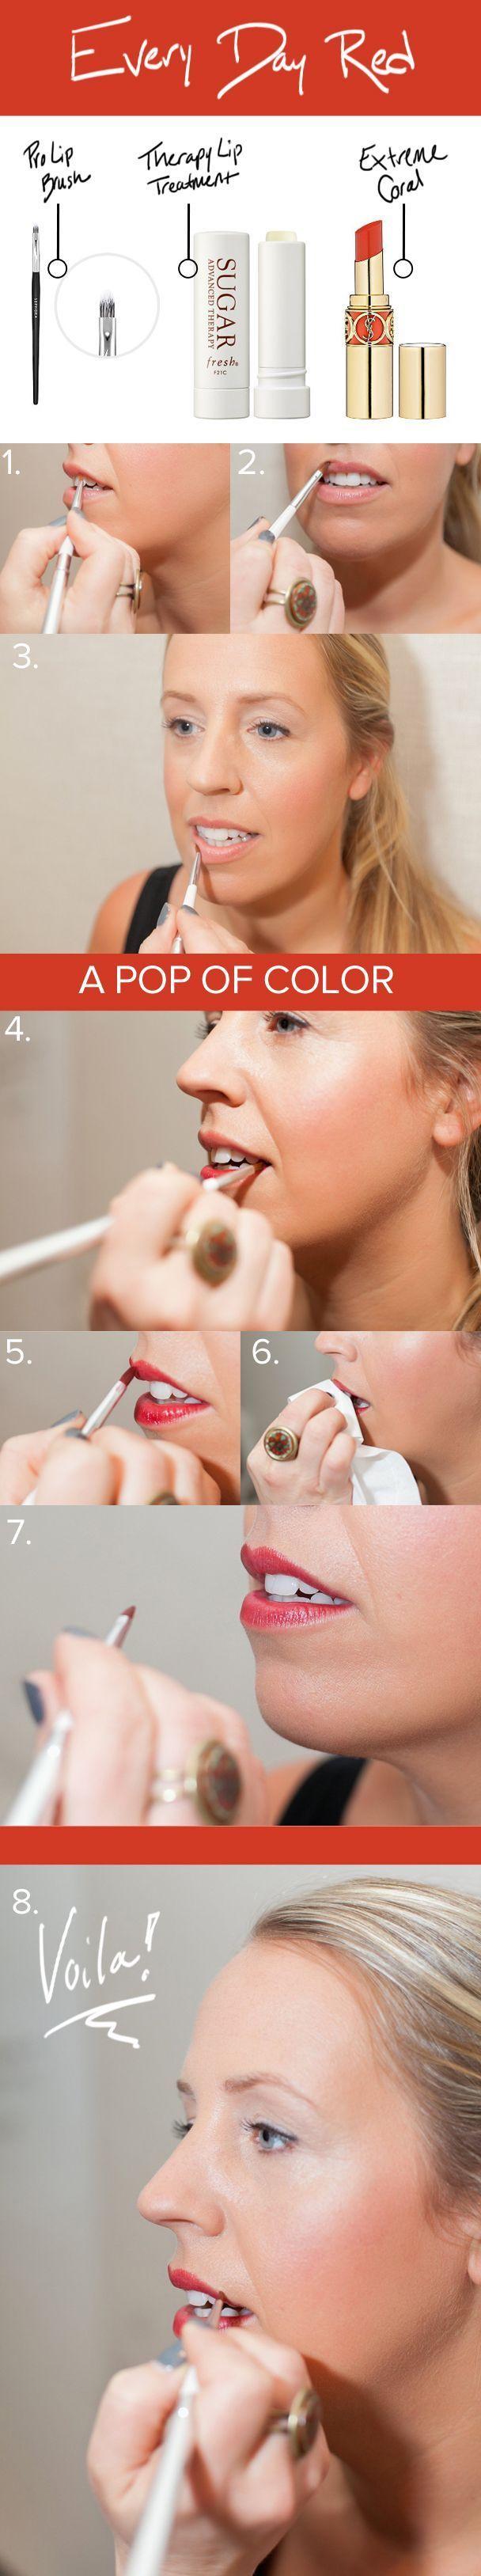 lapetitepeach.com  schminken Tutorial schminken rote Lippen roter Lippenst